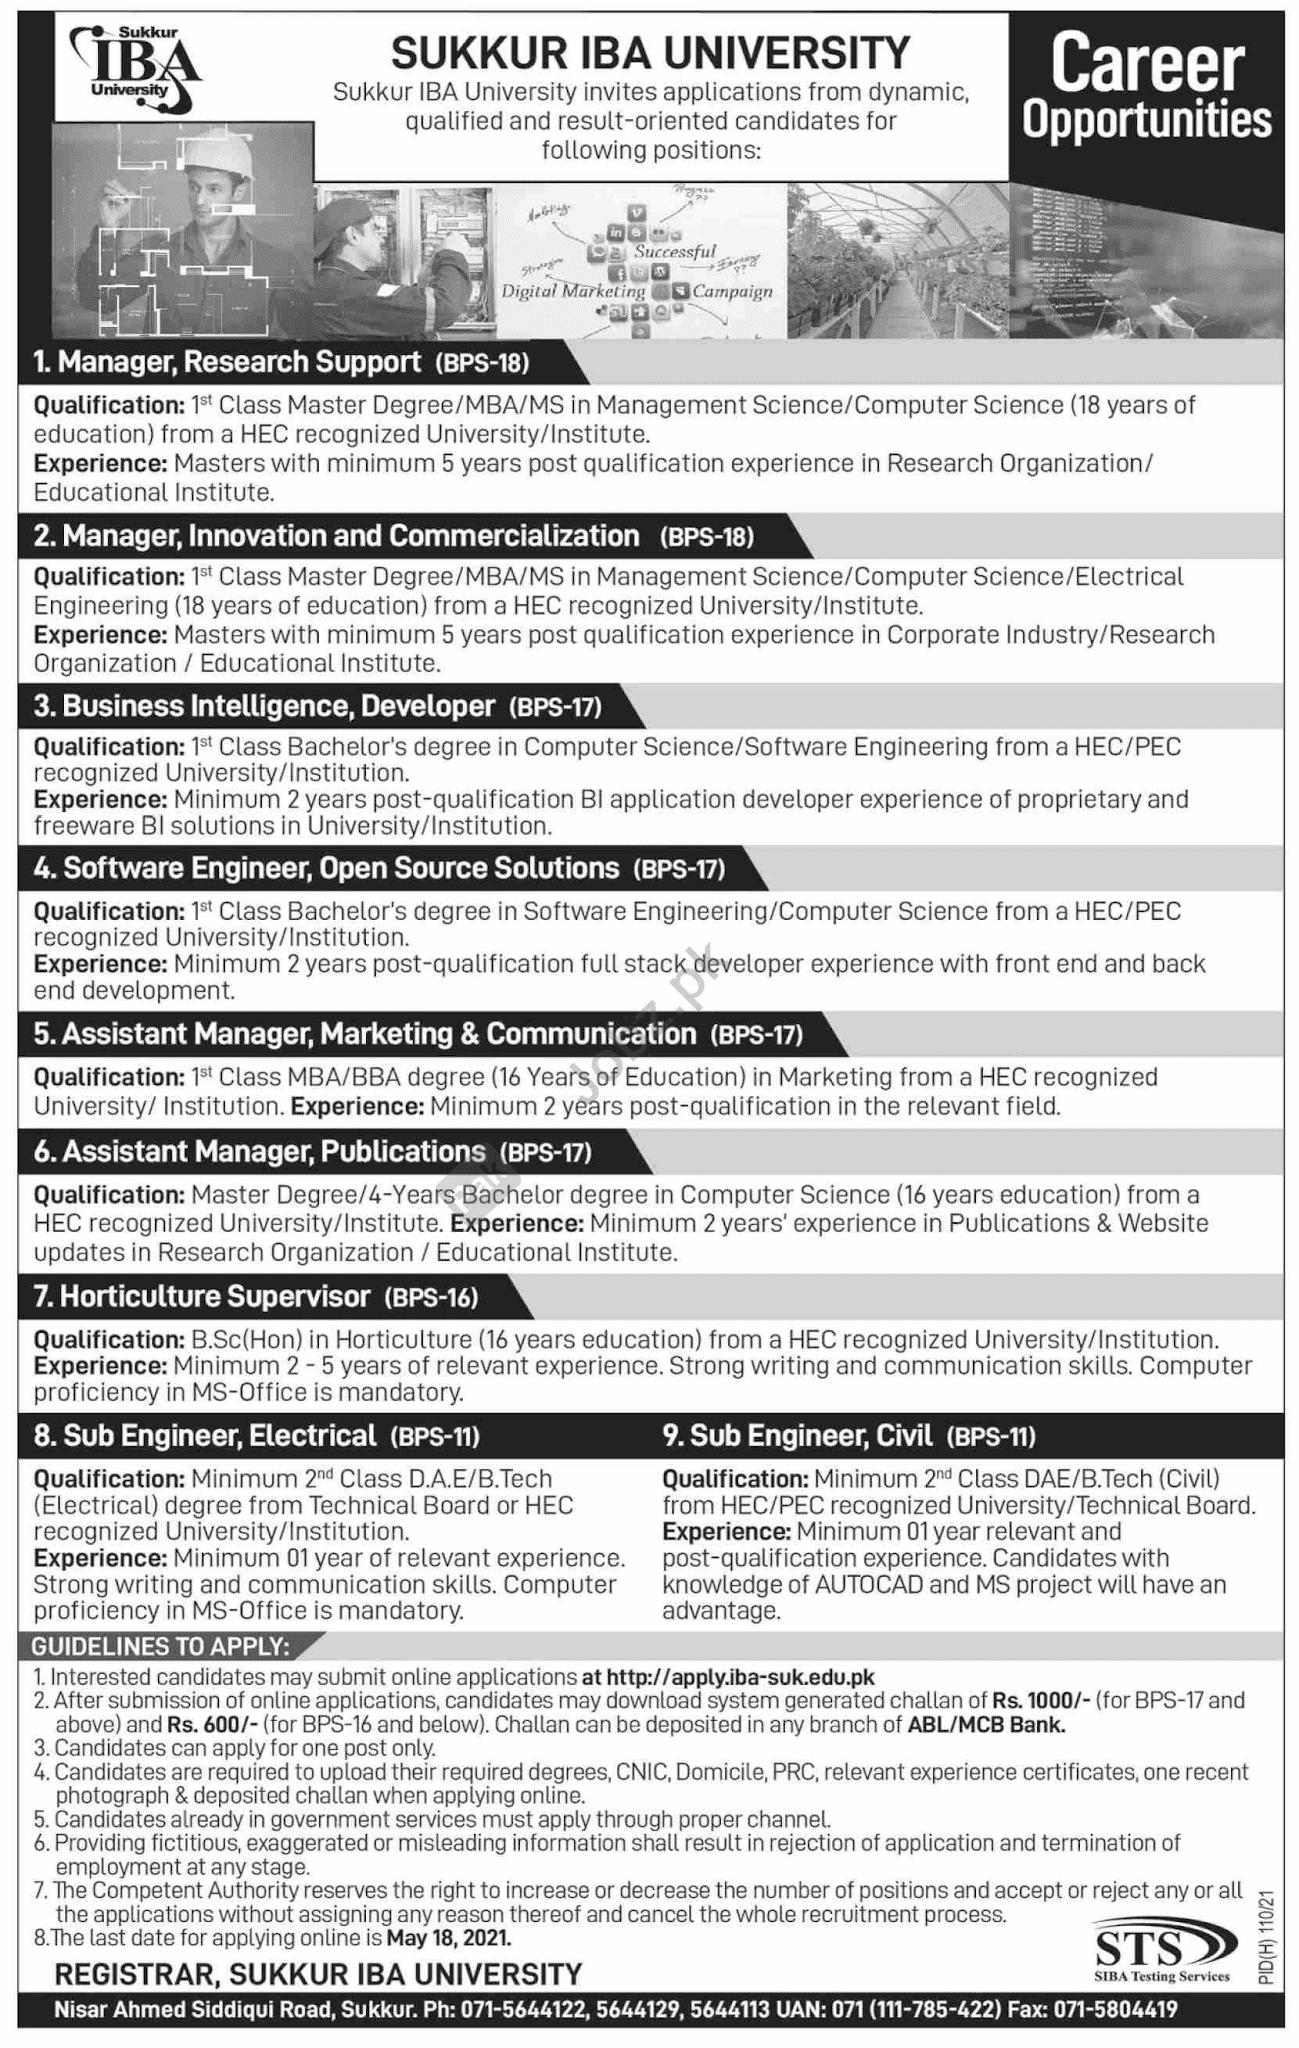 Recent #Jobs - Latest Govt Management Posts In Sukkur IBA University, Sukkur 2021  - Last date 18 May 2021